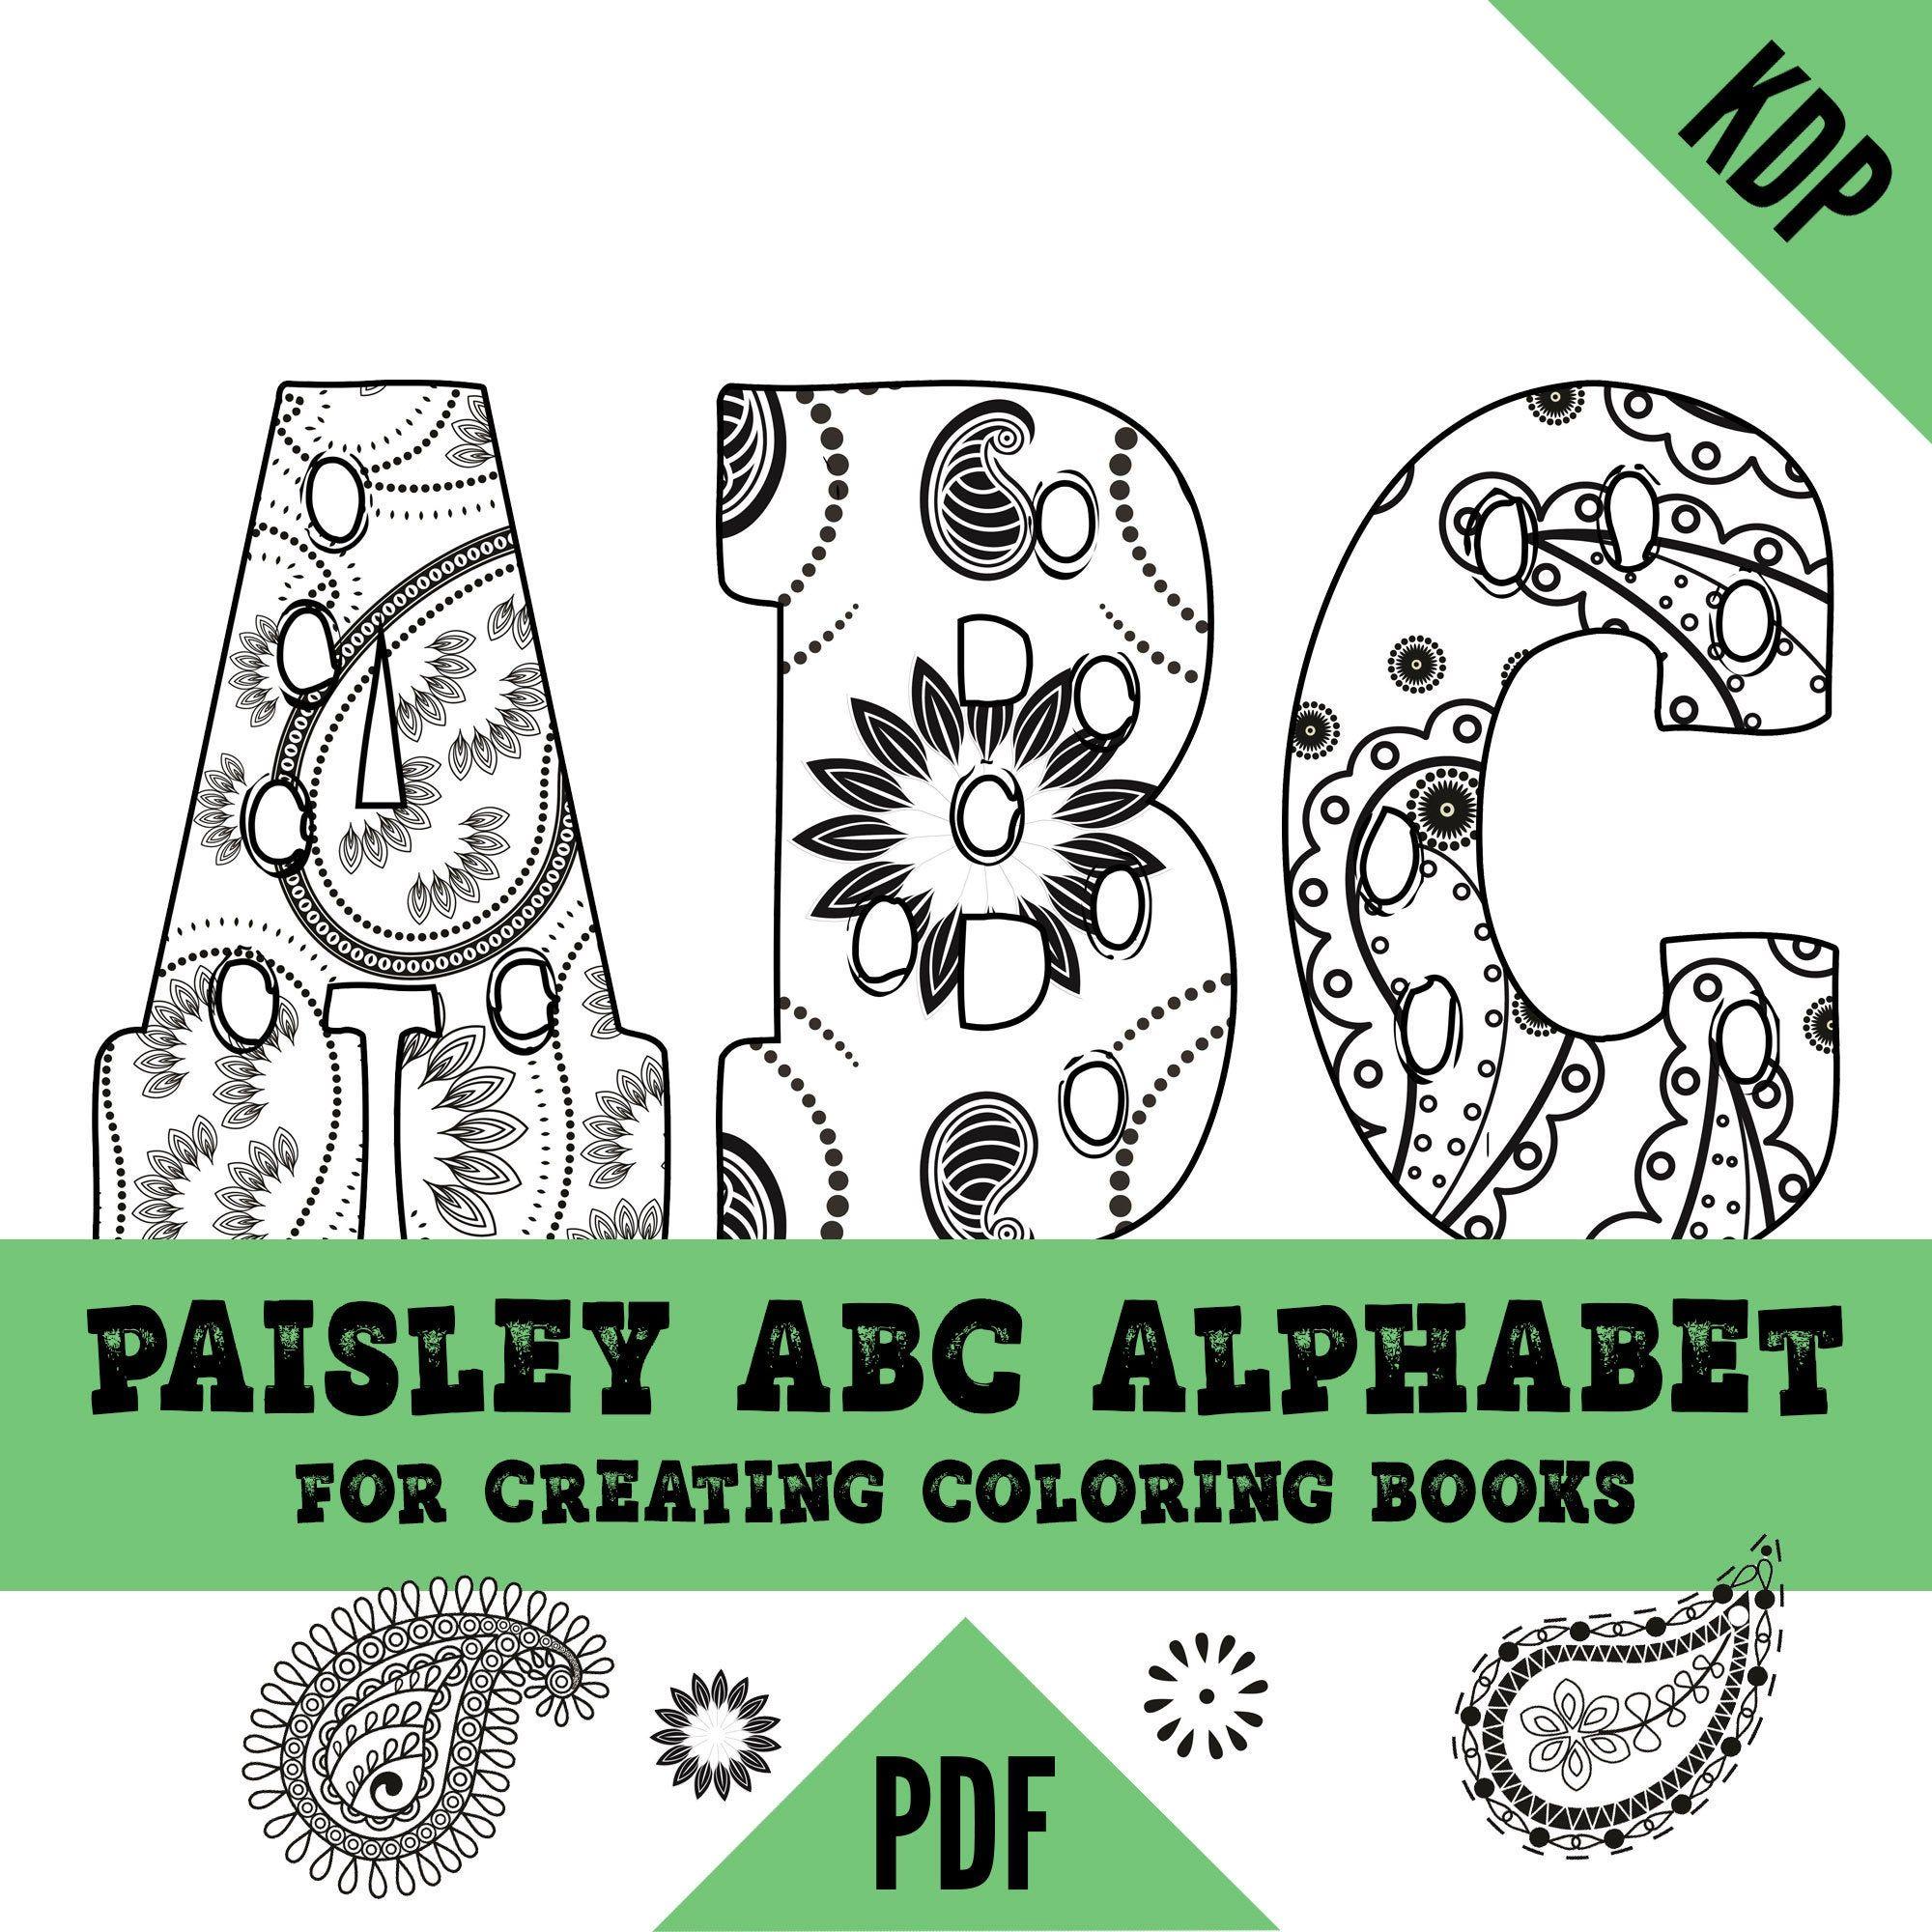 Kdp Alphabet Paisley Coloring Pages Sheets Pdf Abc Letters Etsy Paisley Coloring Pages Coloring Pages Paisley Color